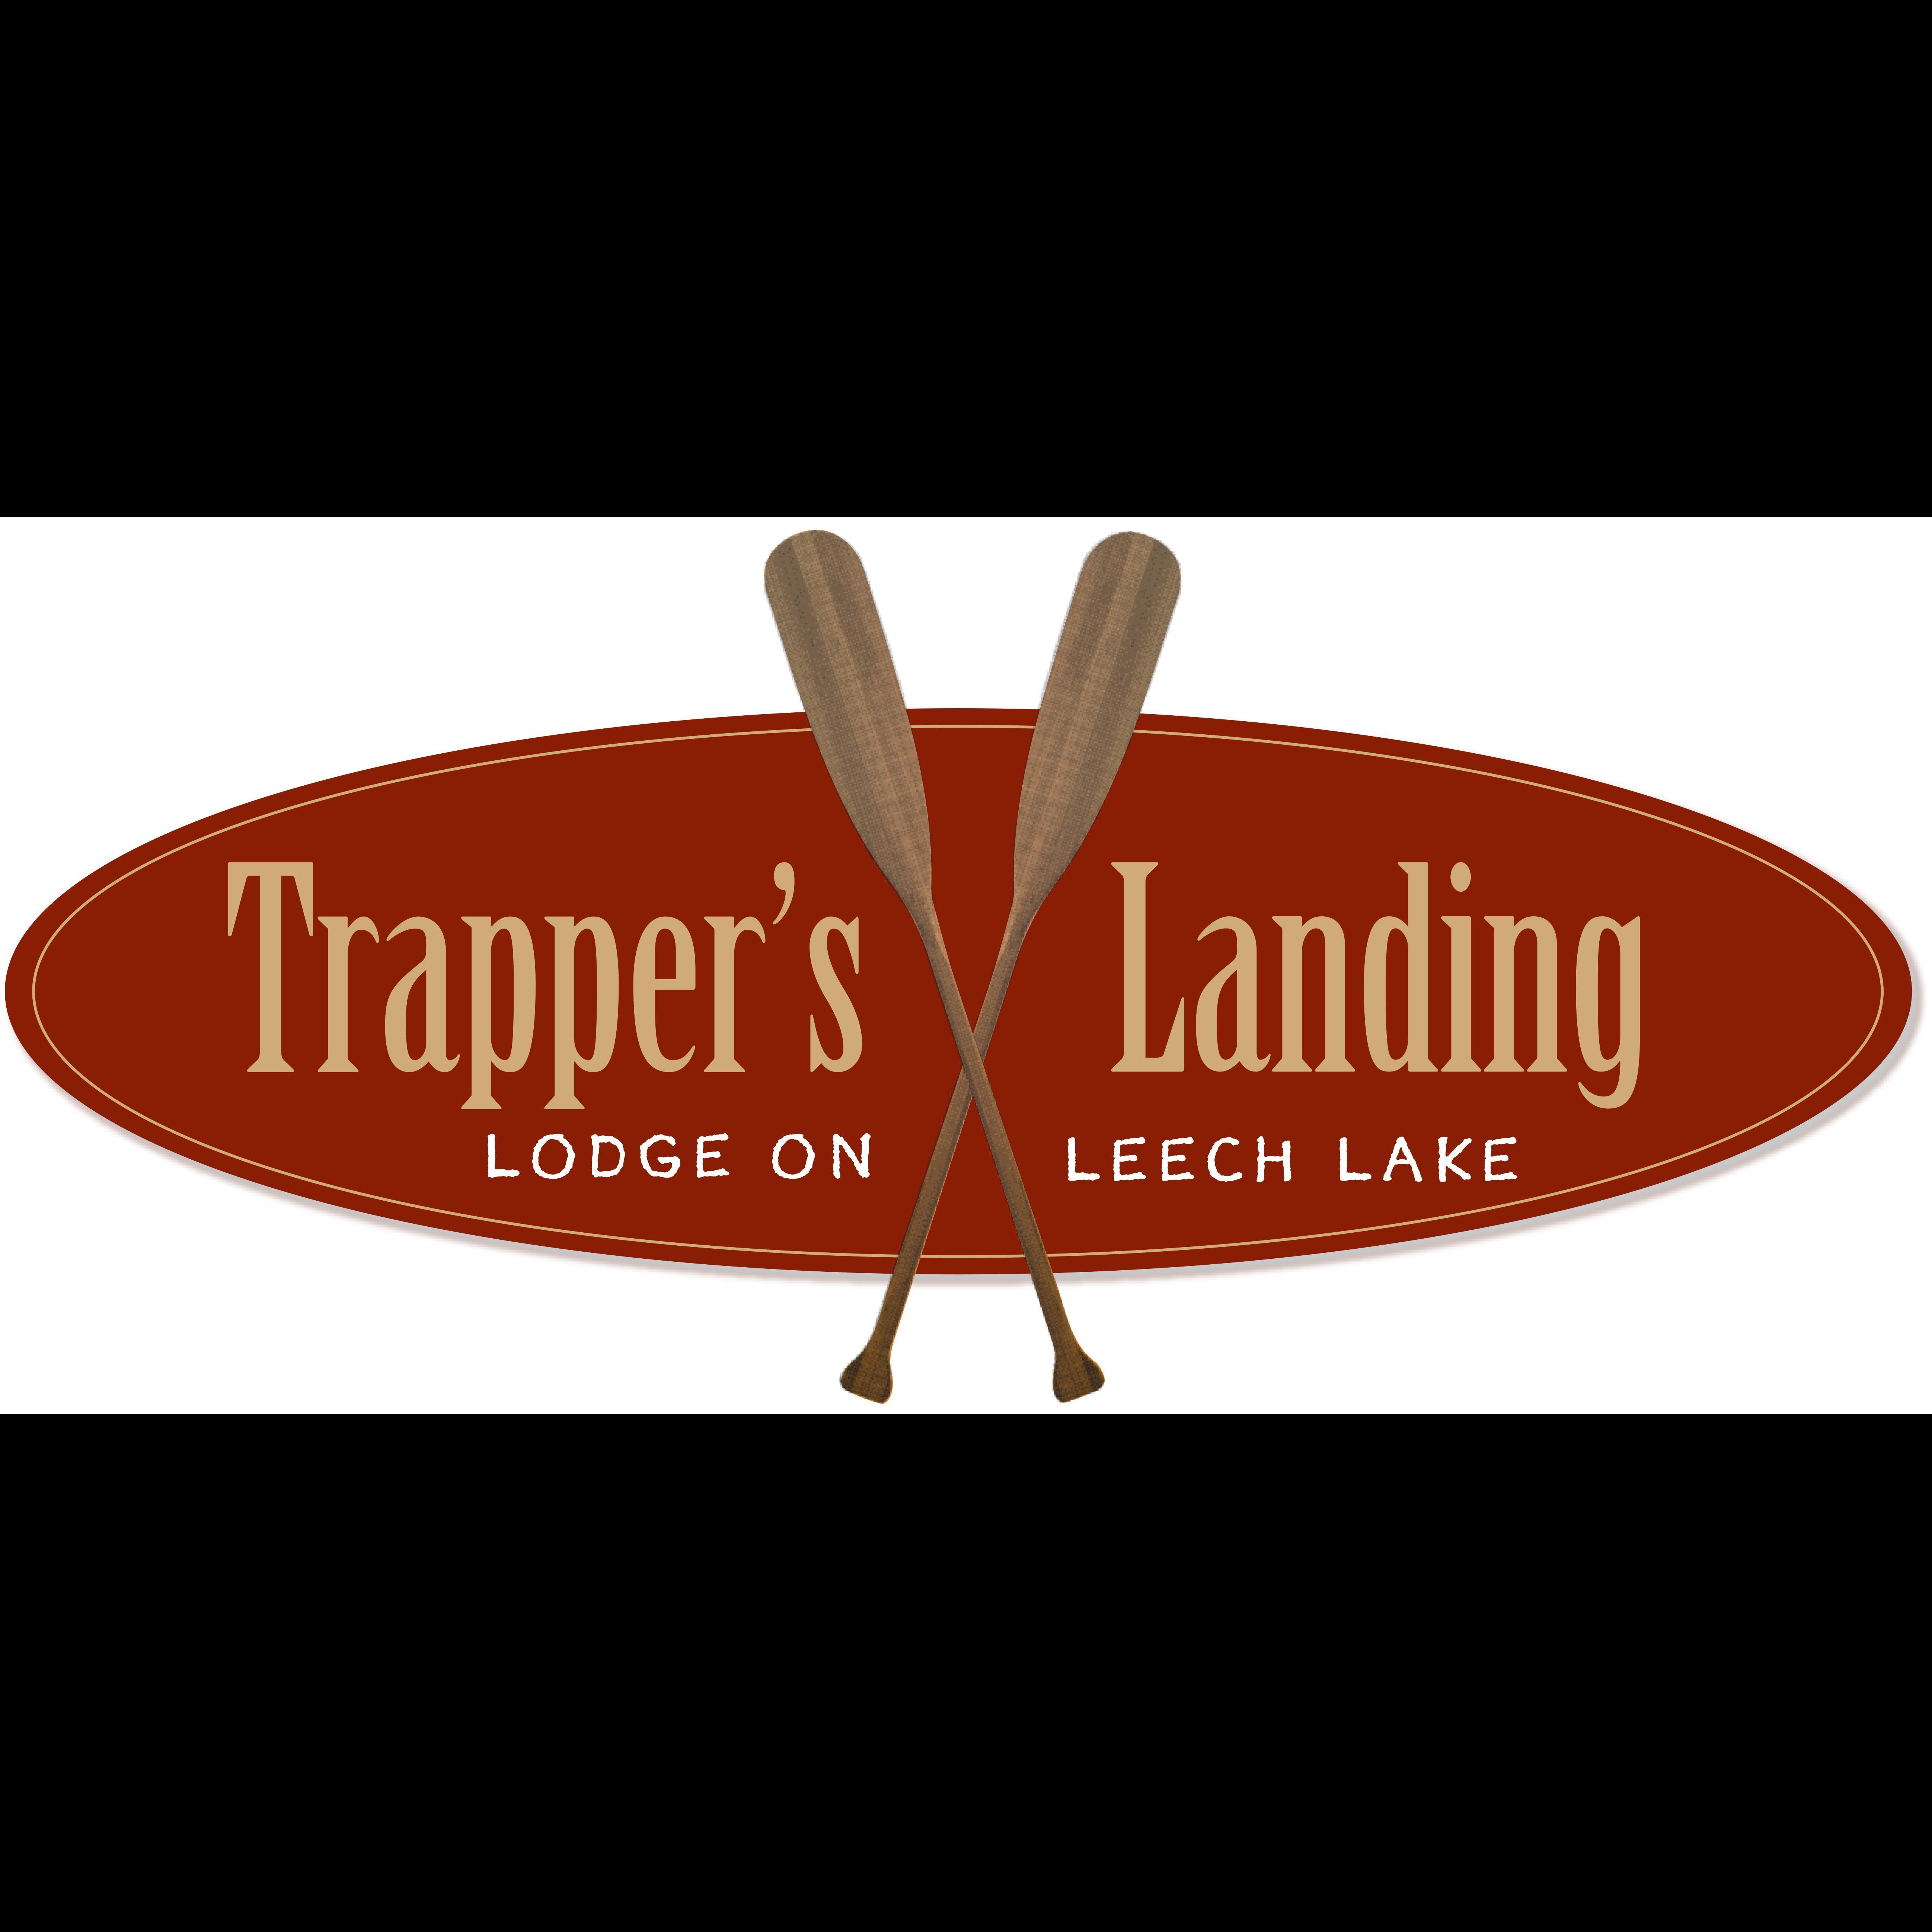 Trapper's Landing Lodge image 5